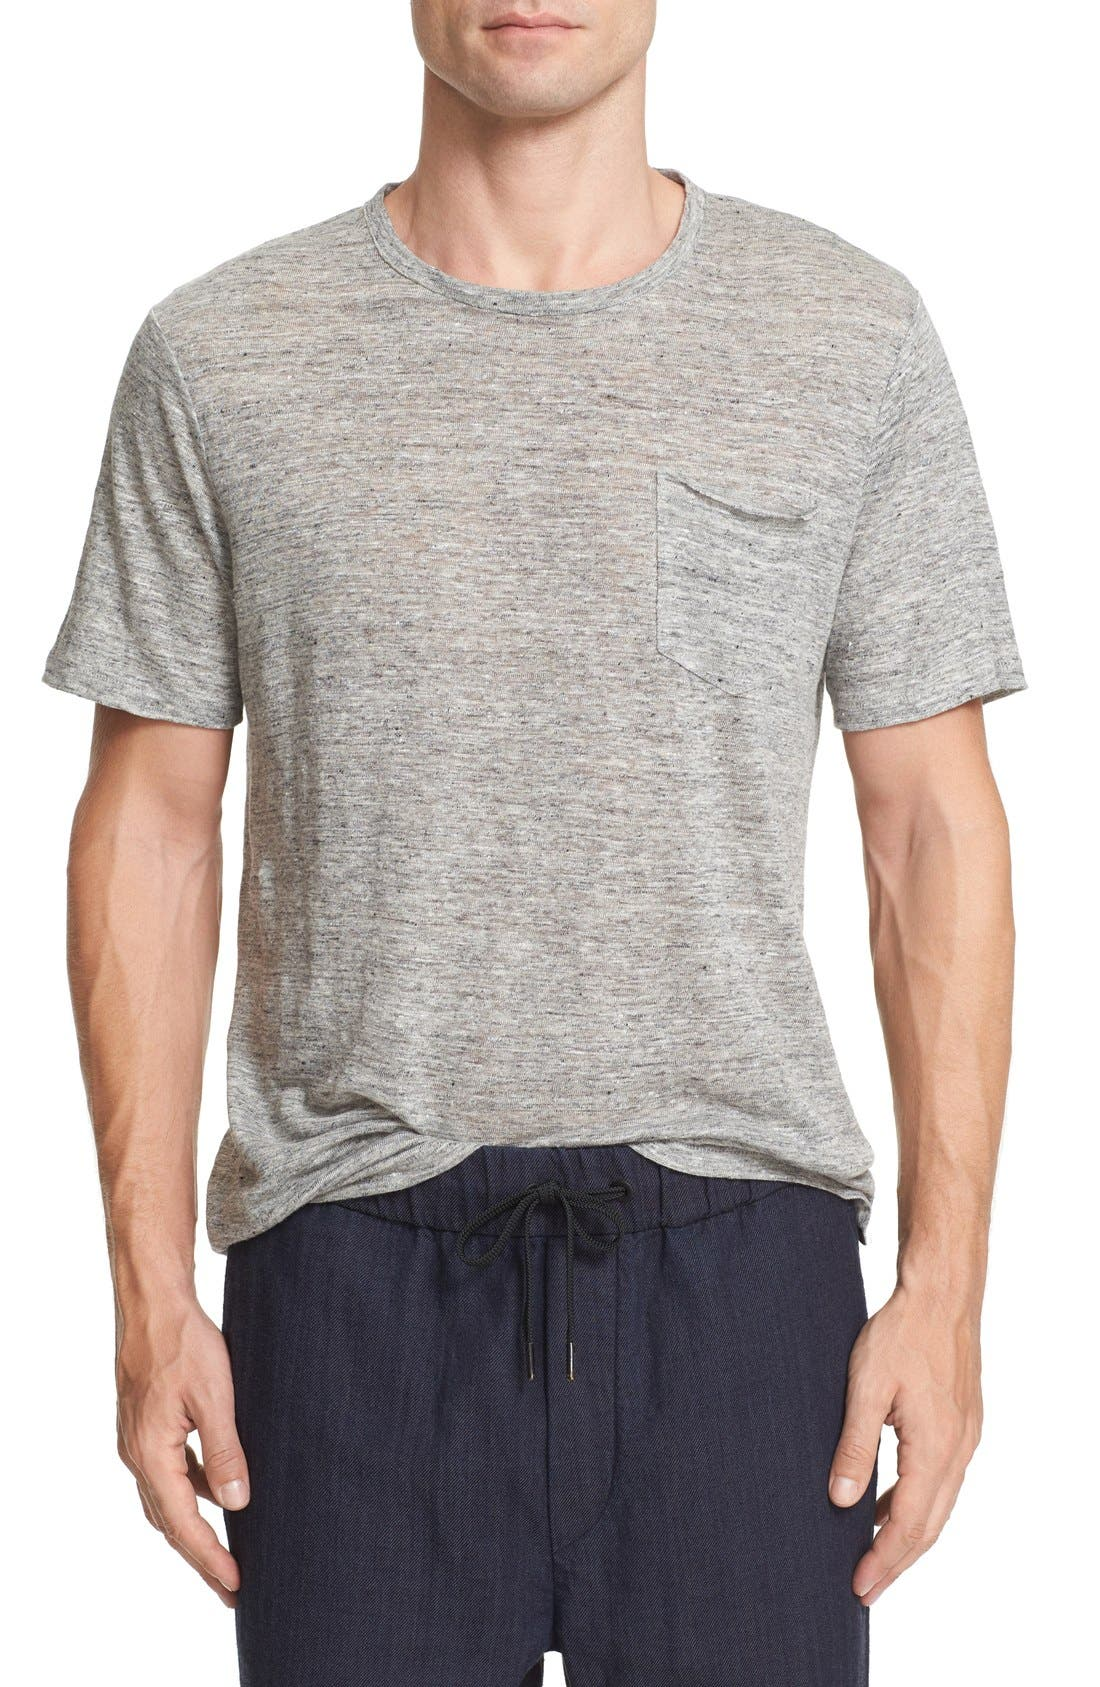 Alternate Image 1 Selected - rag & bone Owen Slub Linen T-Shirt